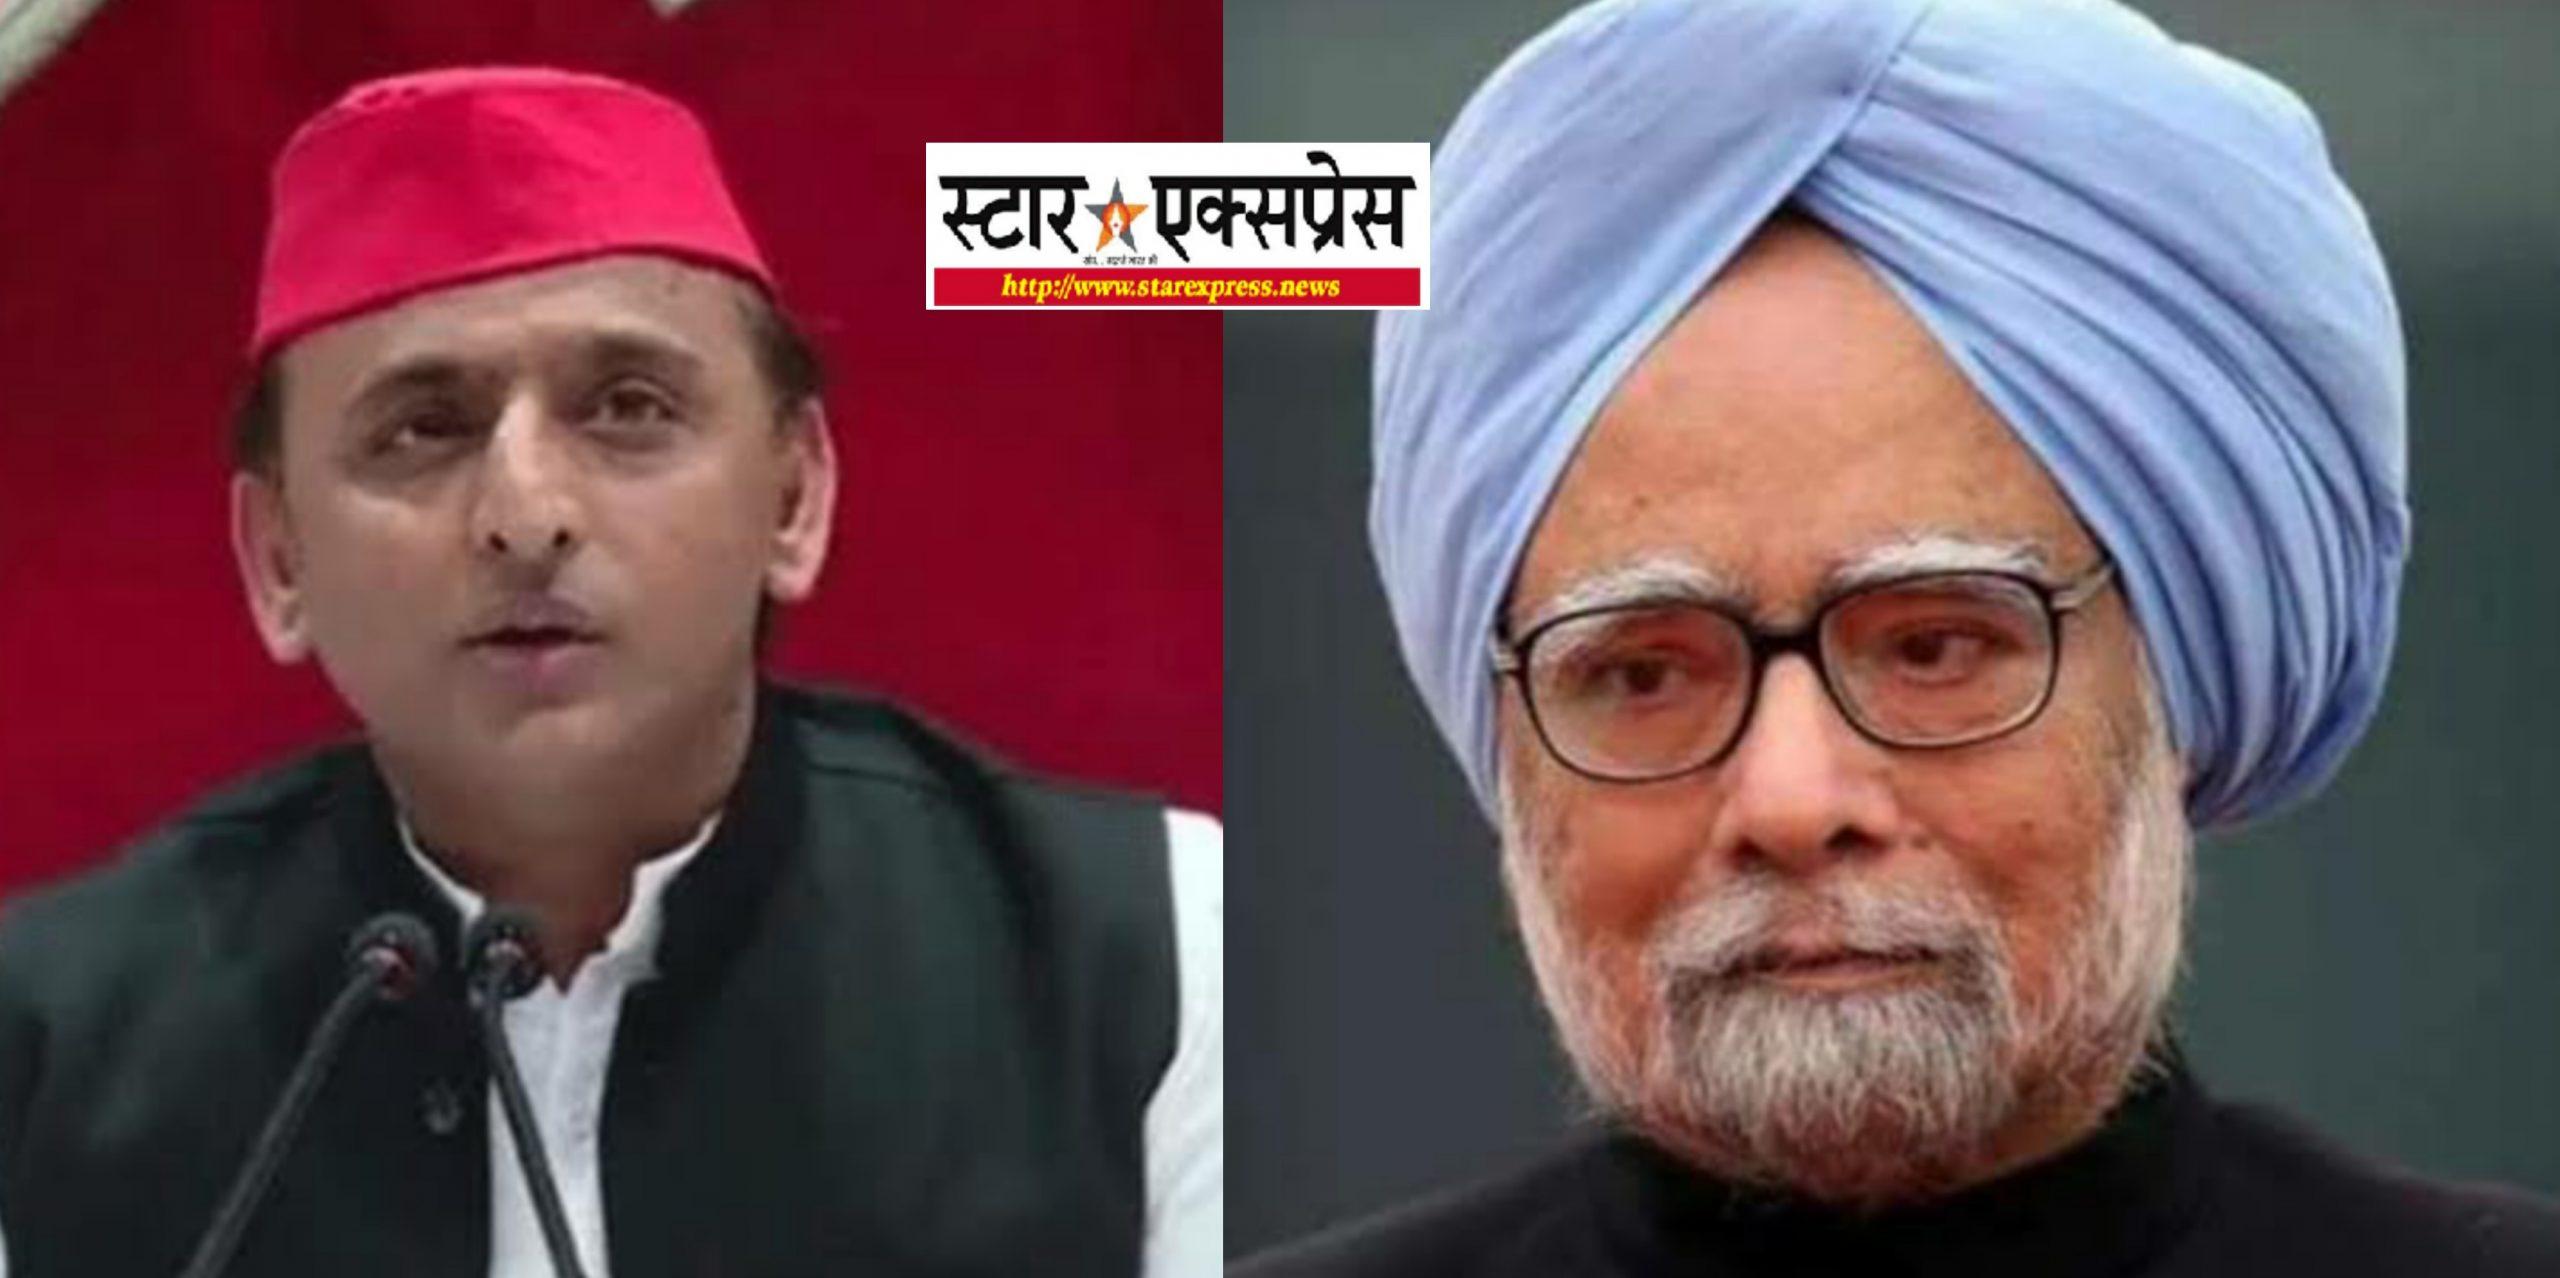 Photo of पूर्व PM मनमोहन सिंह कोरोना पॉजिटिव, अखिलेश यादव ने की स्वस्थ होने की कामना